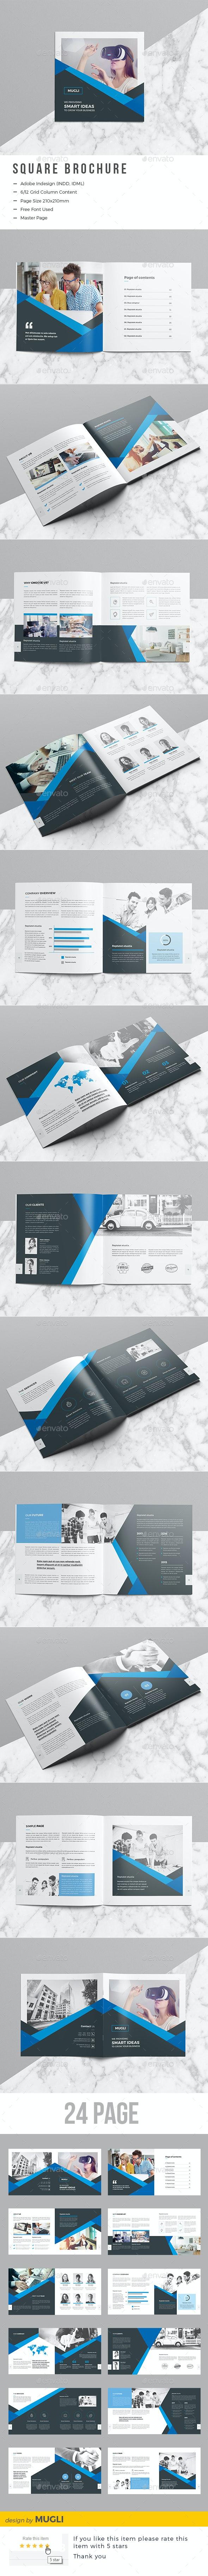 Square Brochure - Corporate Brochures